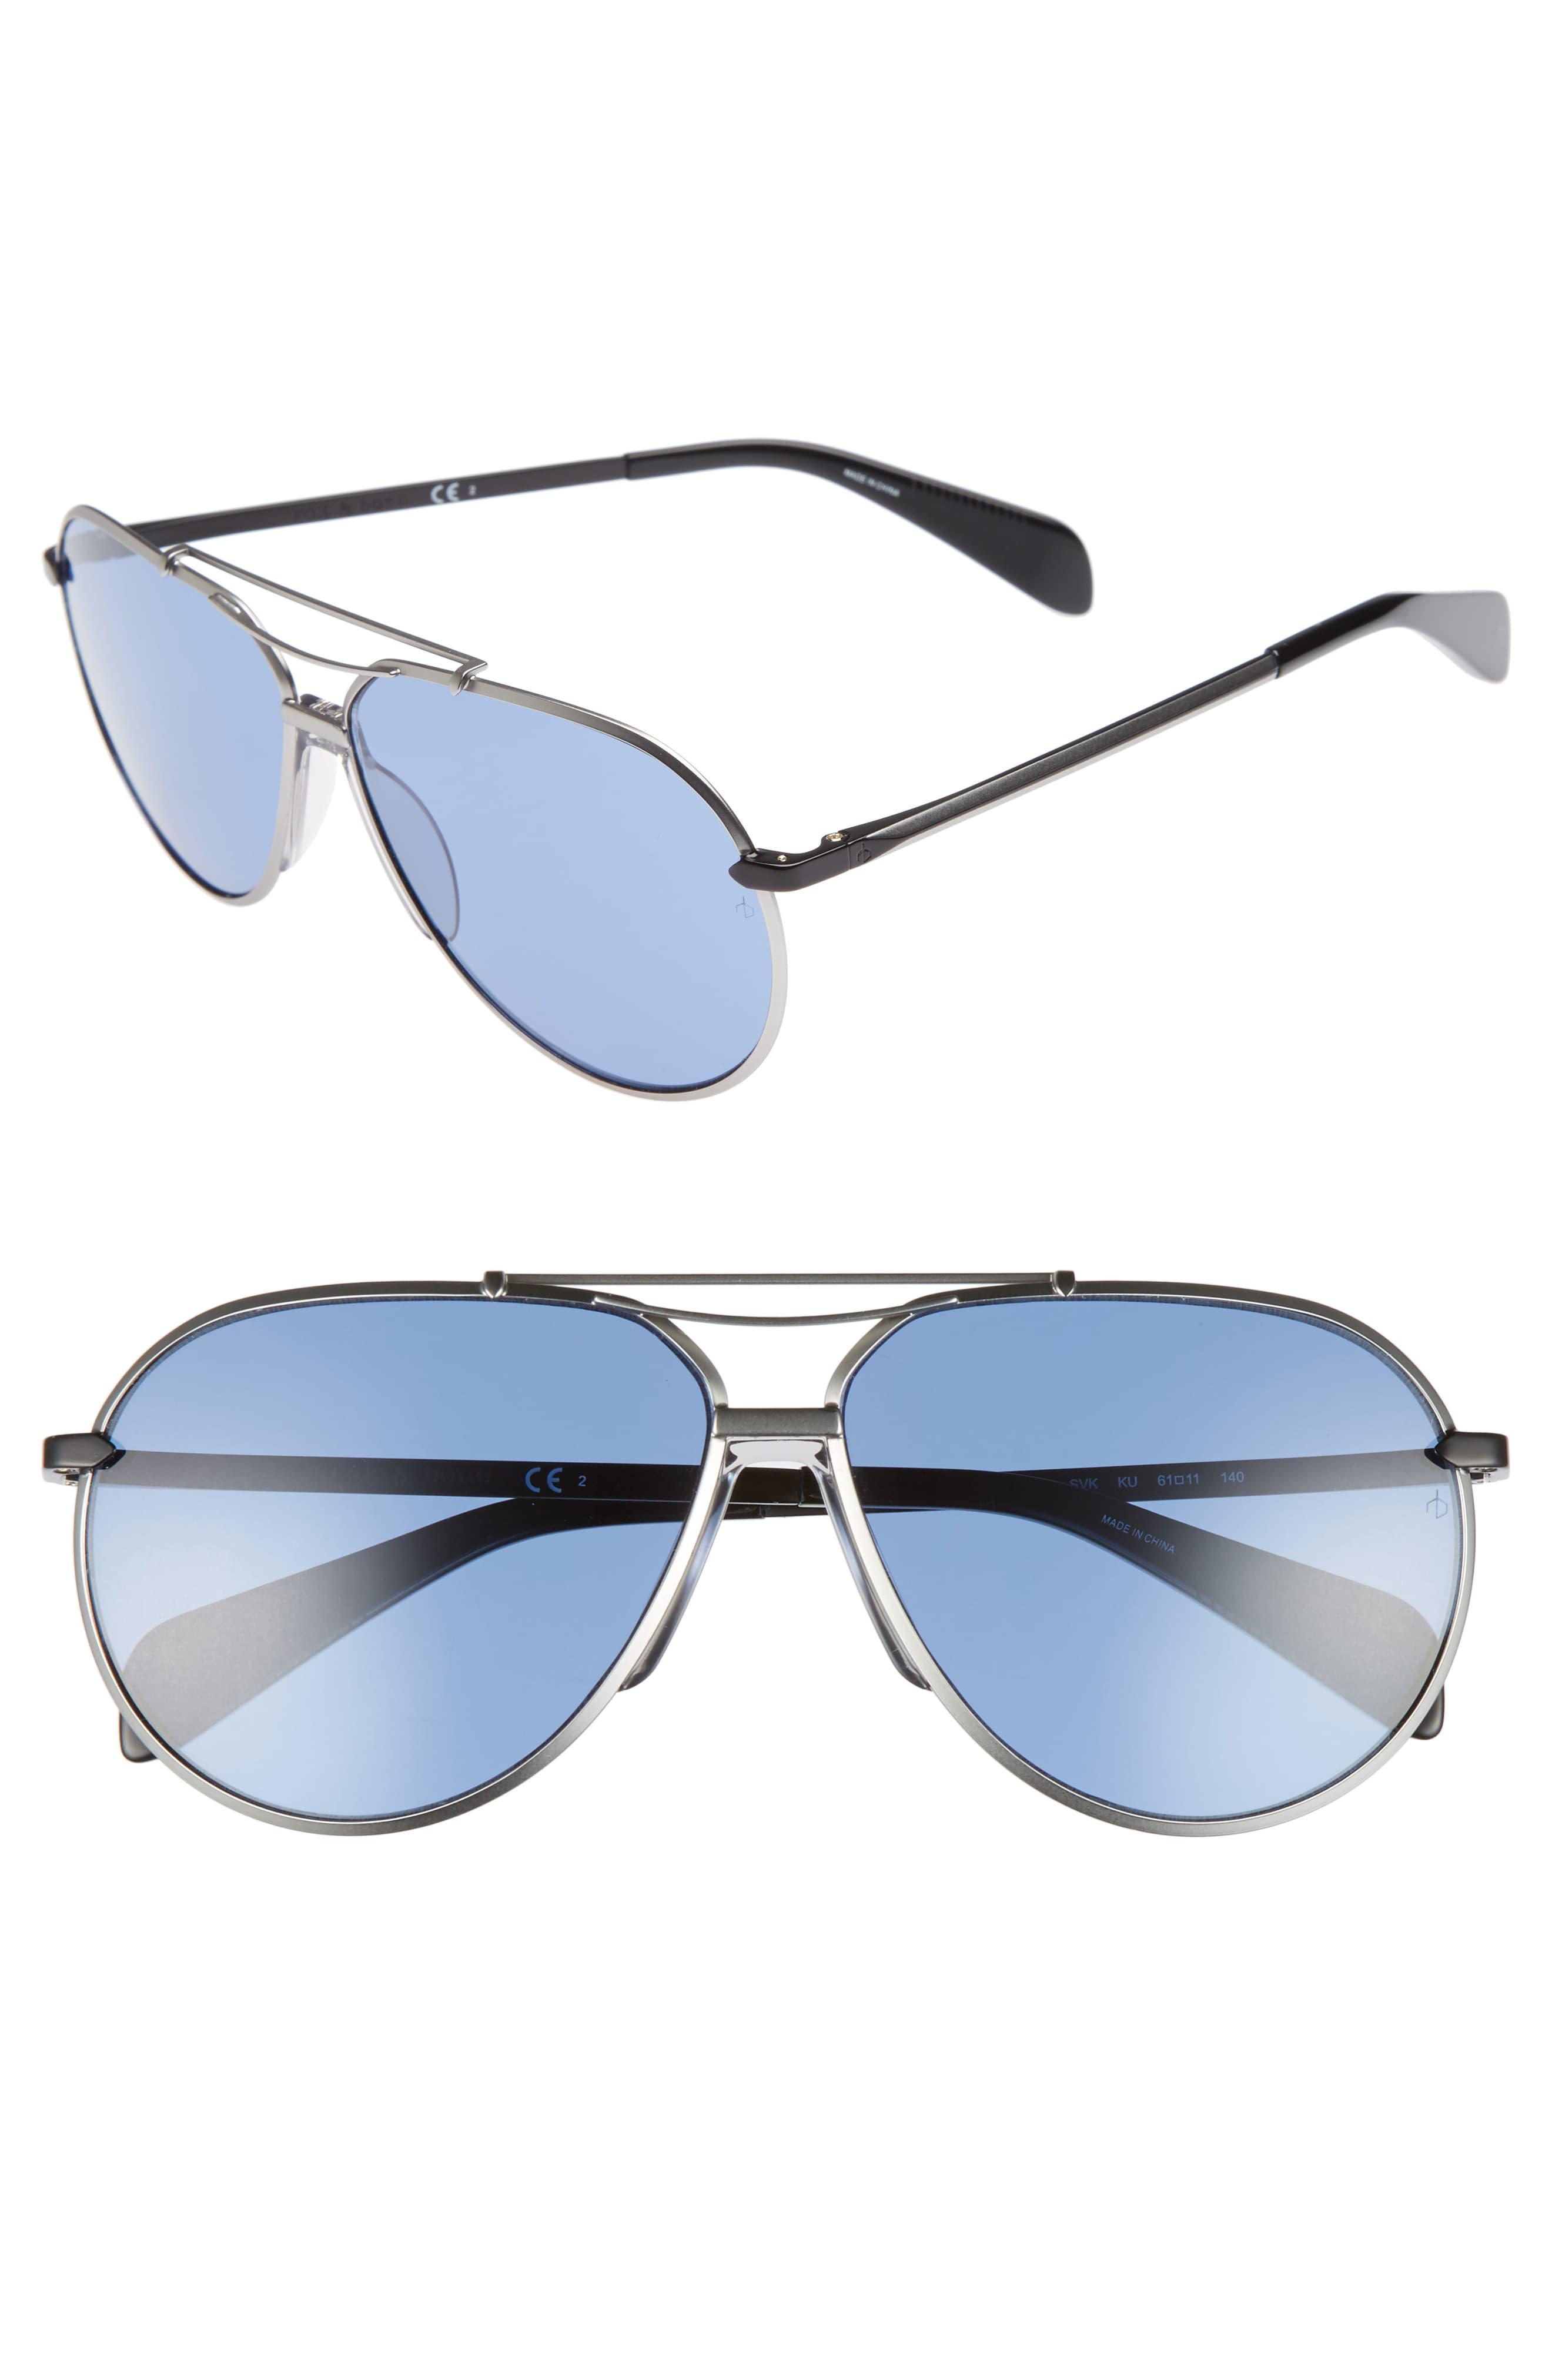 d36976b43237 Lyst - Rag & Bone 61mm Aviator Sunglasses in Metallic for Men